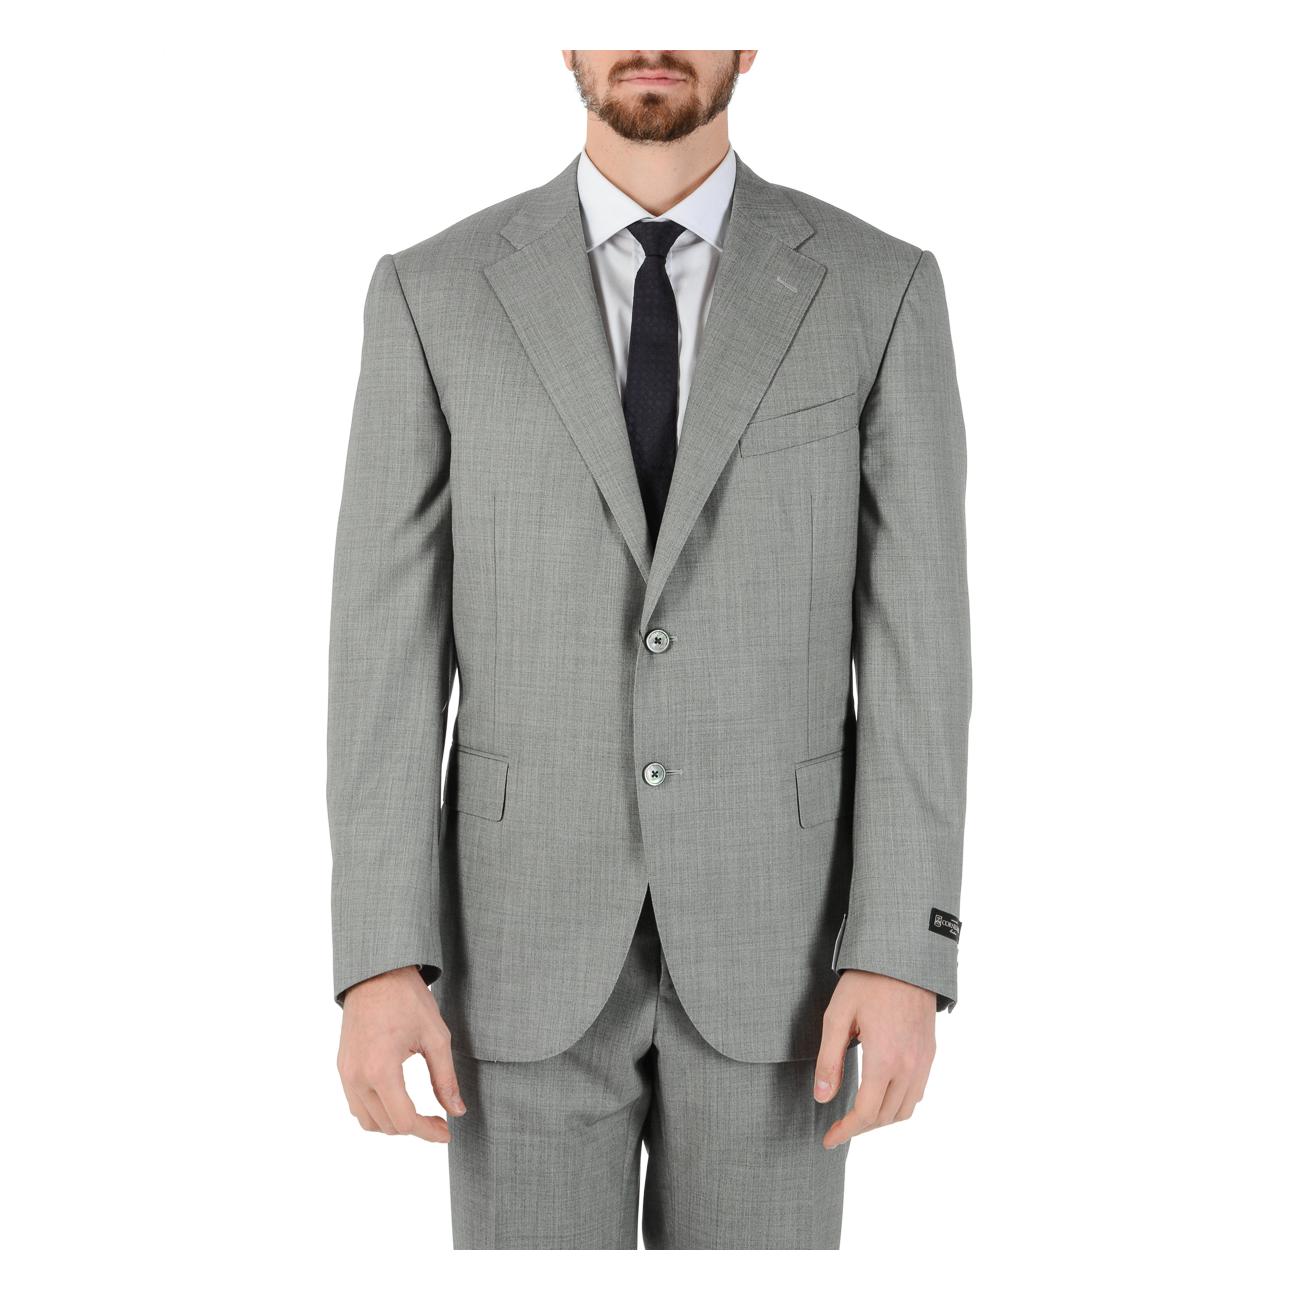 corneliani-mens-suit-long-sleeves-grey-super-160-s-2